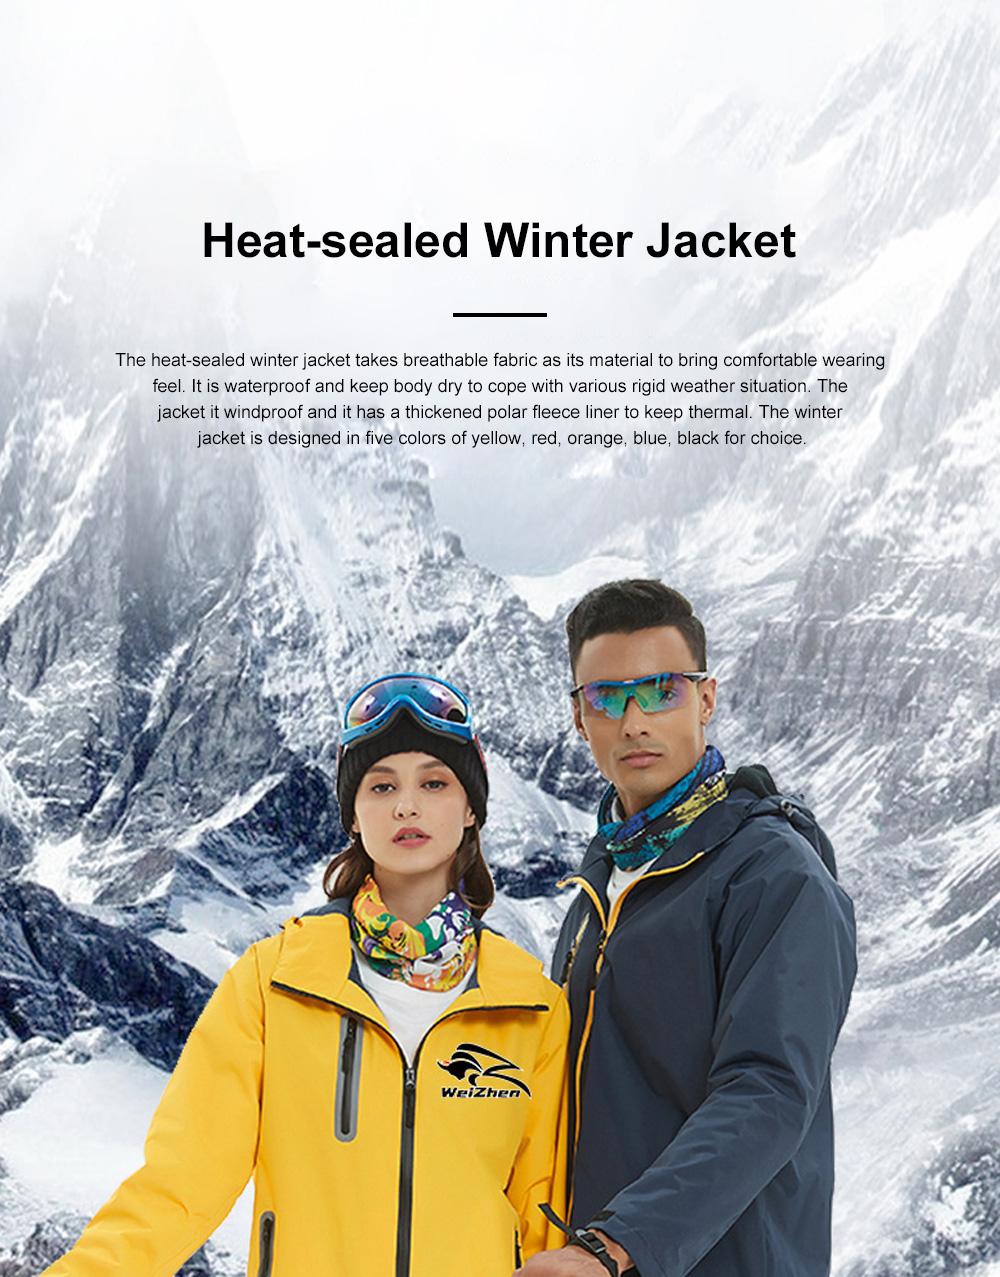 Lovers' Heat-sealed Winter Jacket for Outdoors Hiking Climbing Thickened Waterproof Interchange Jacket Polar Fleece Liner Outdoor Jacket 0